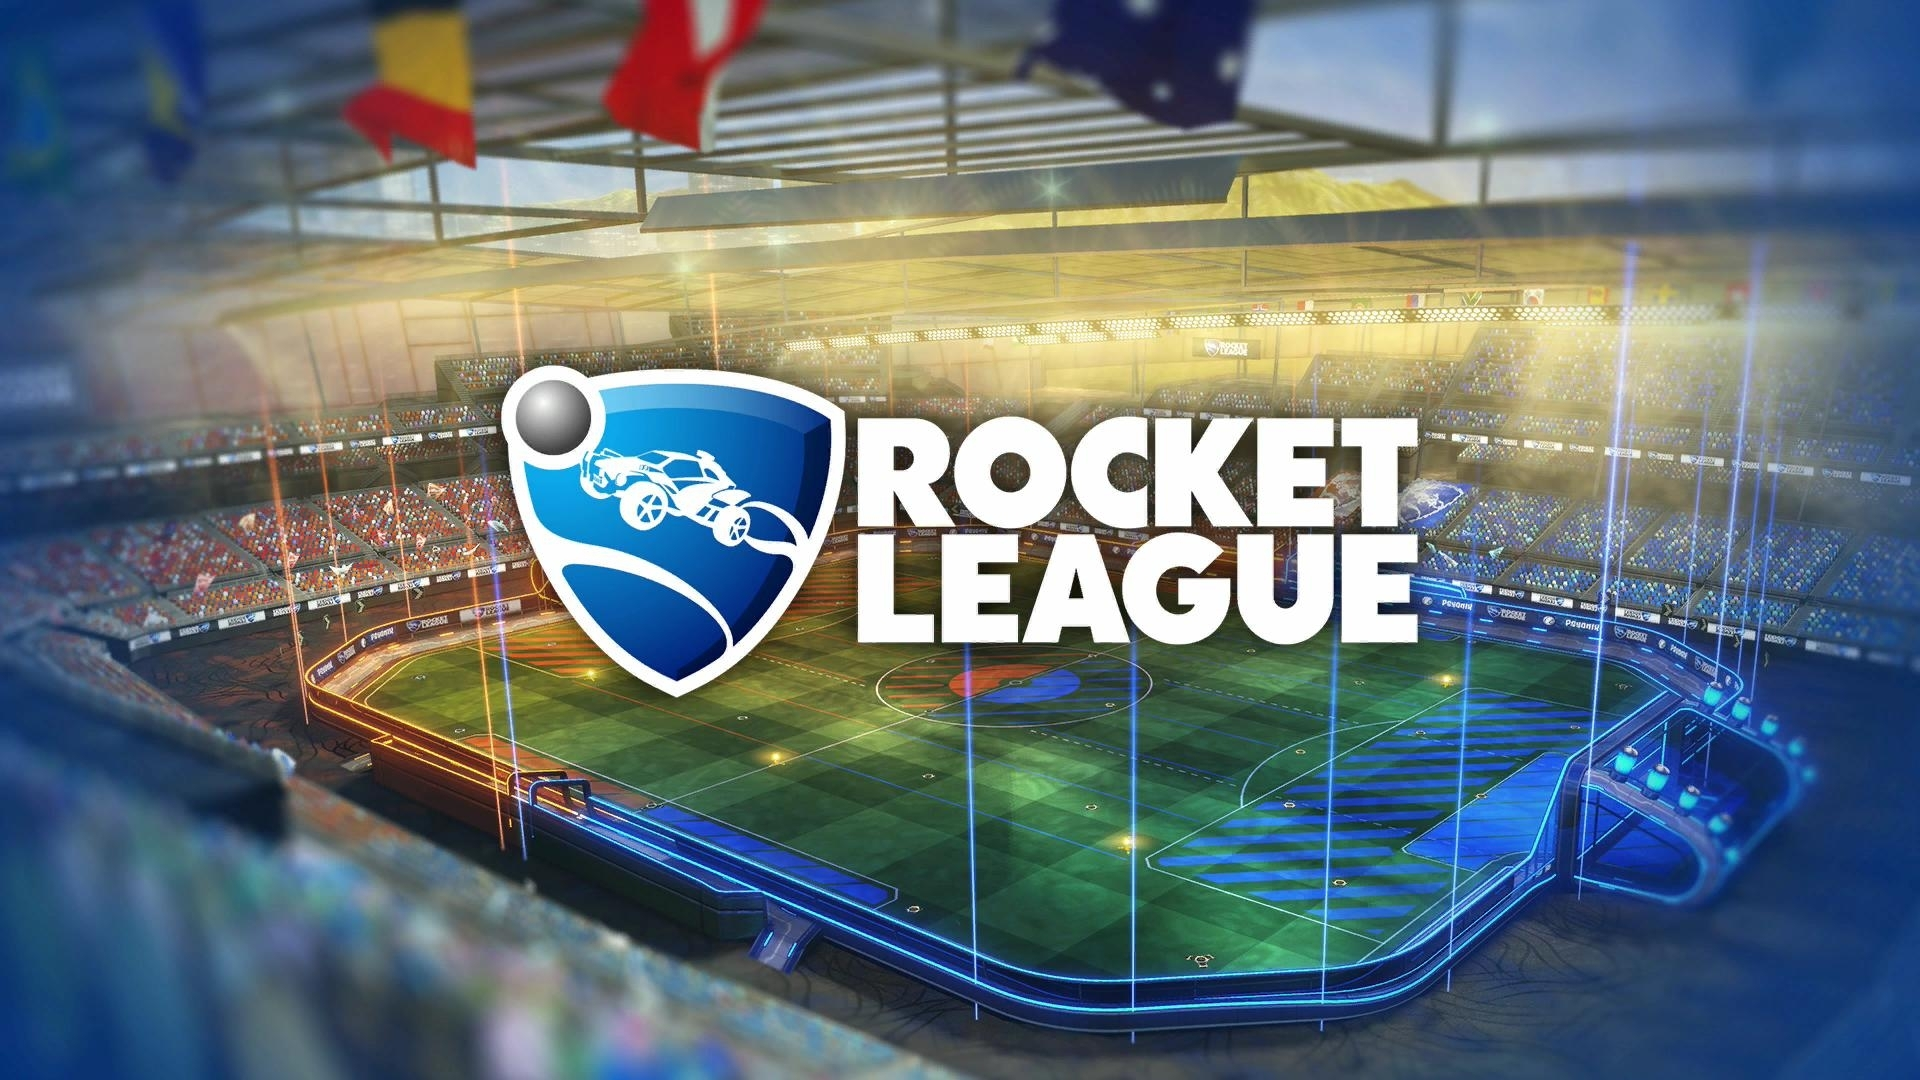 rocket league game hd wallpaper 61731 1920x1080 px ~ hdwallsource